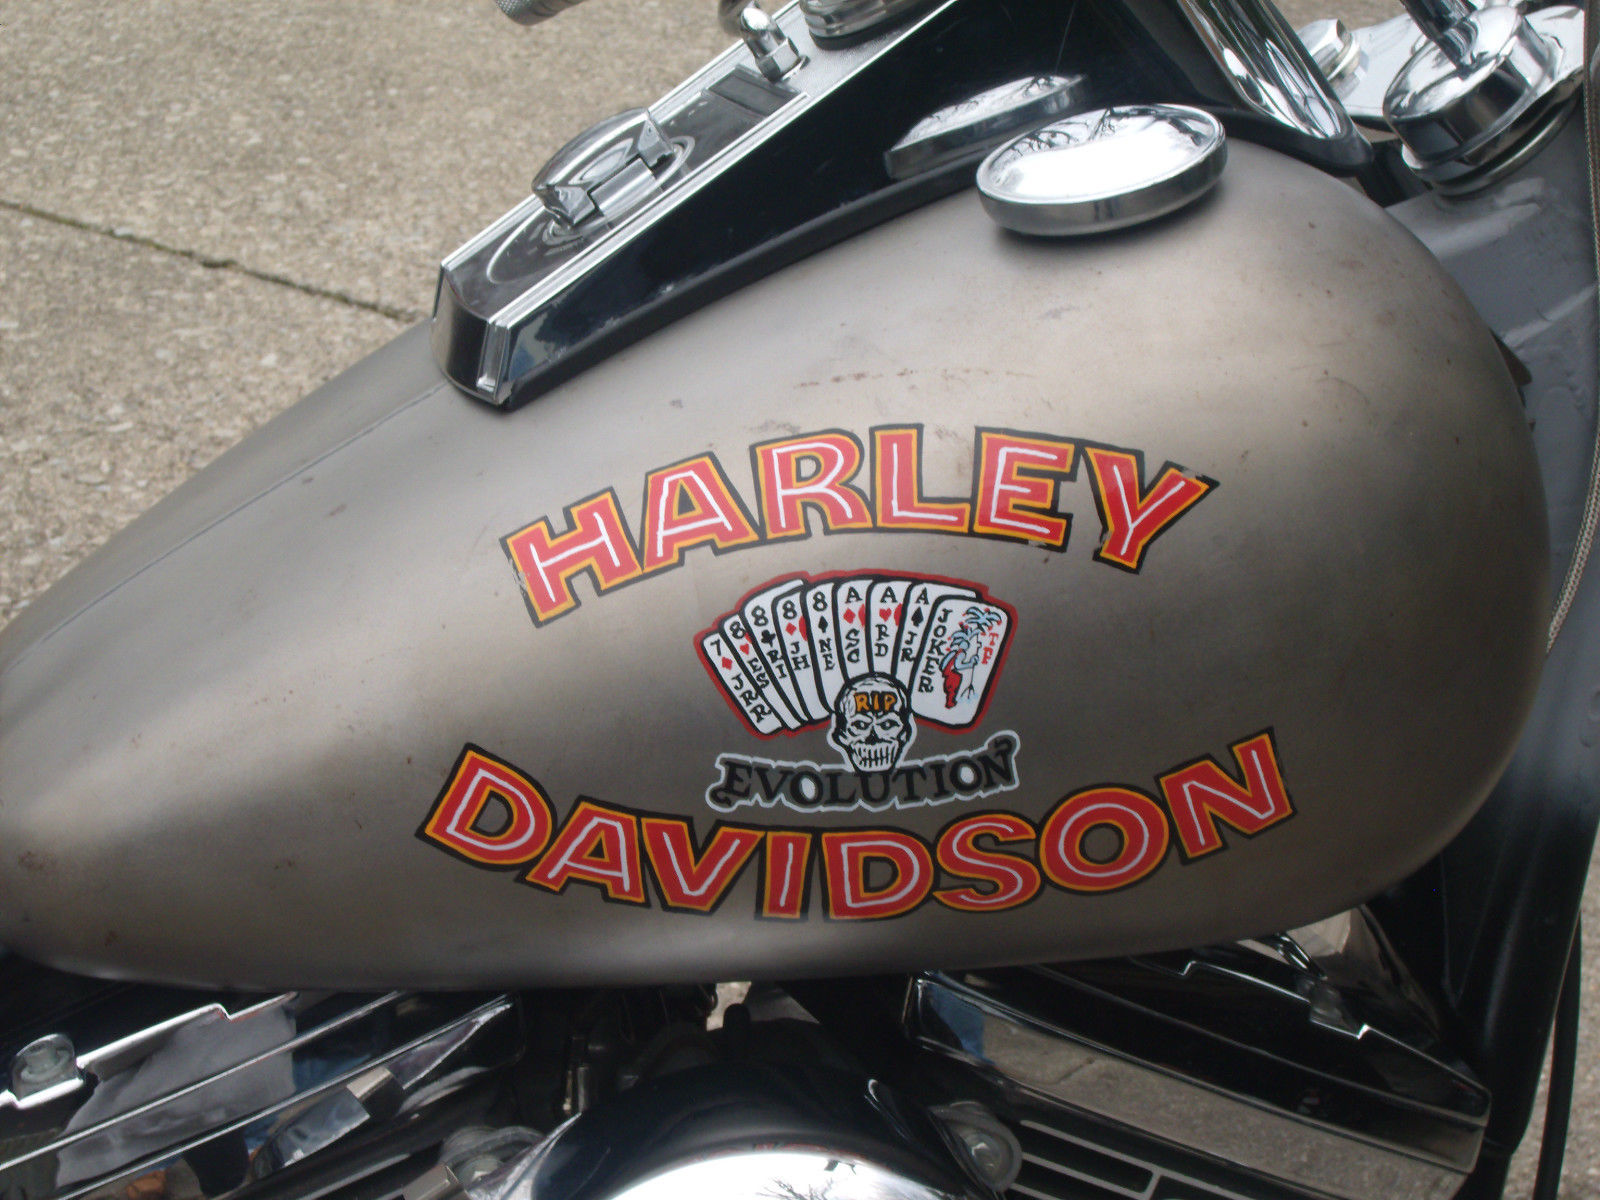 Harley Davidson And The Marlboro Man Replica Bike For Sale - tobakko